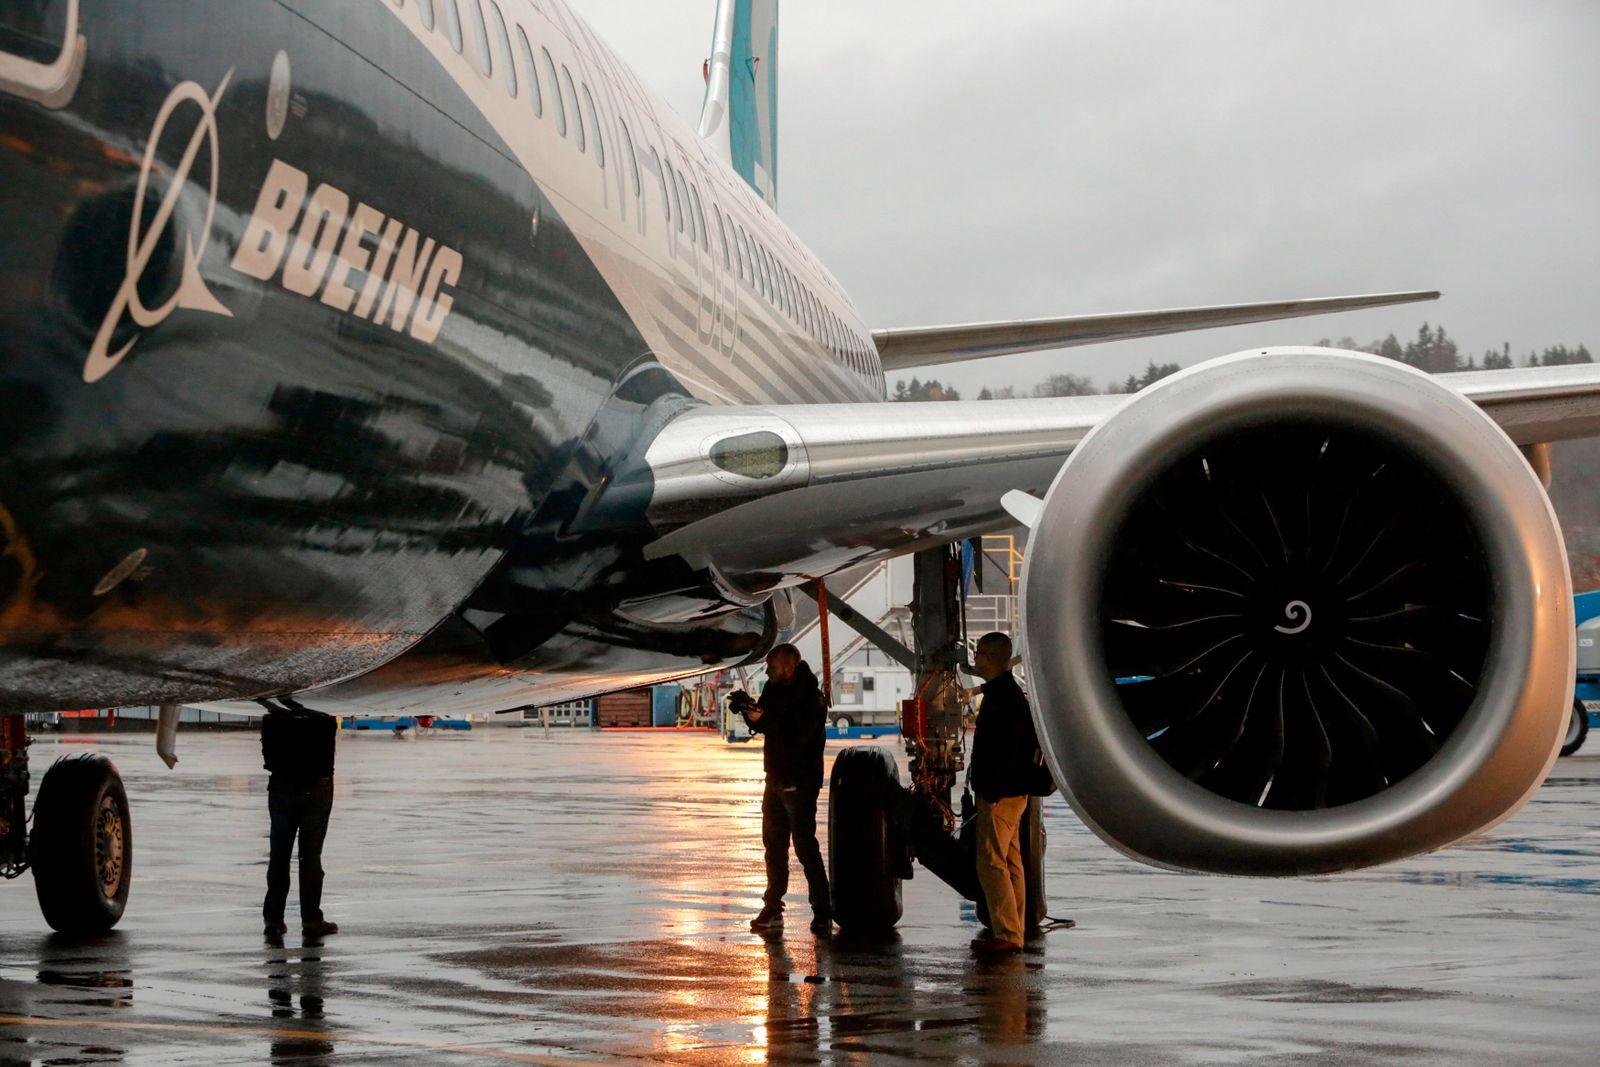 FILES-US-AVIATION-AEROSPACE-737MAX-BOEING-EARNINGS